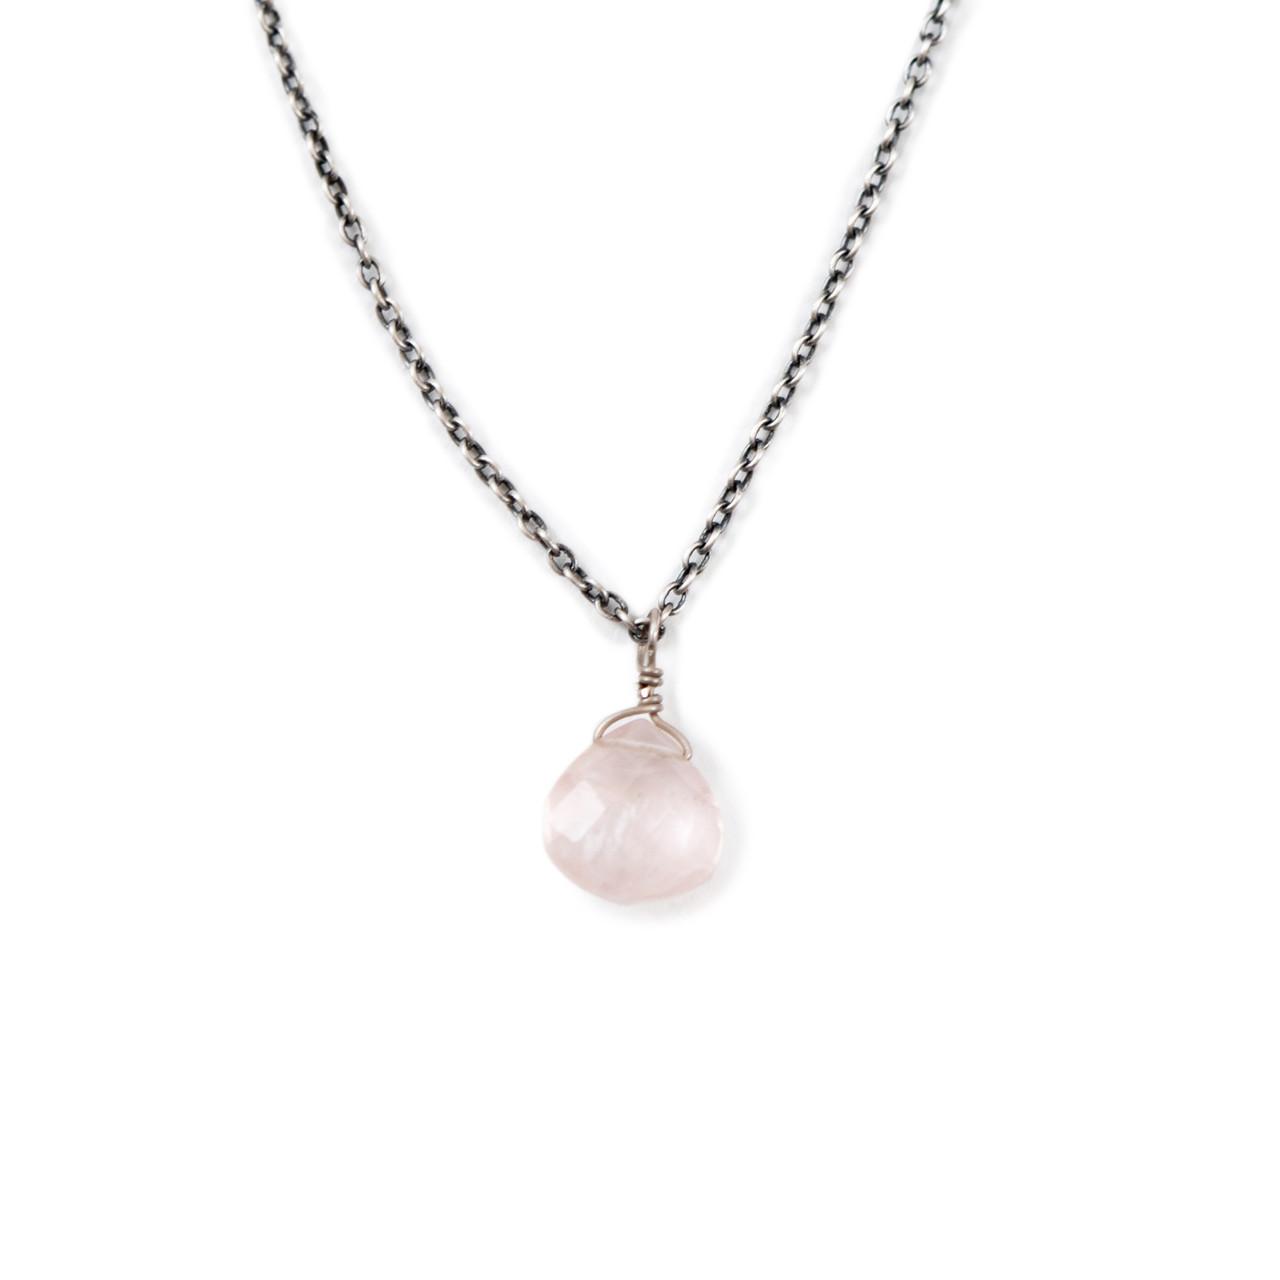 oxidized necklace with rose quartz stone